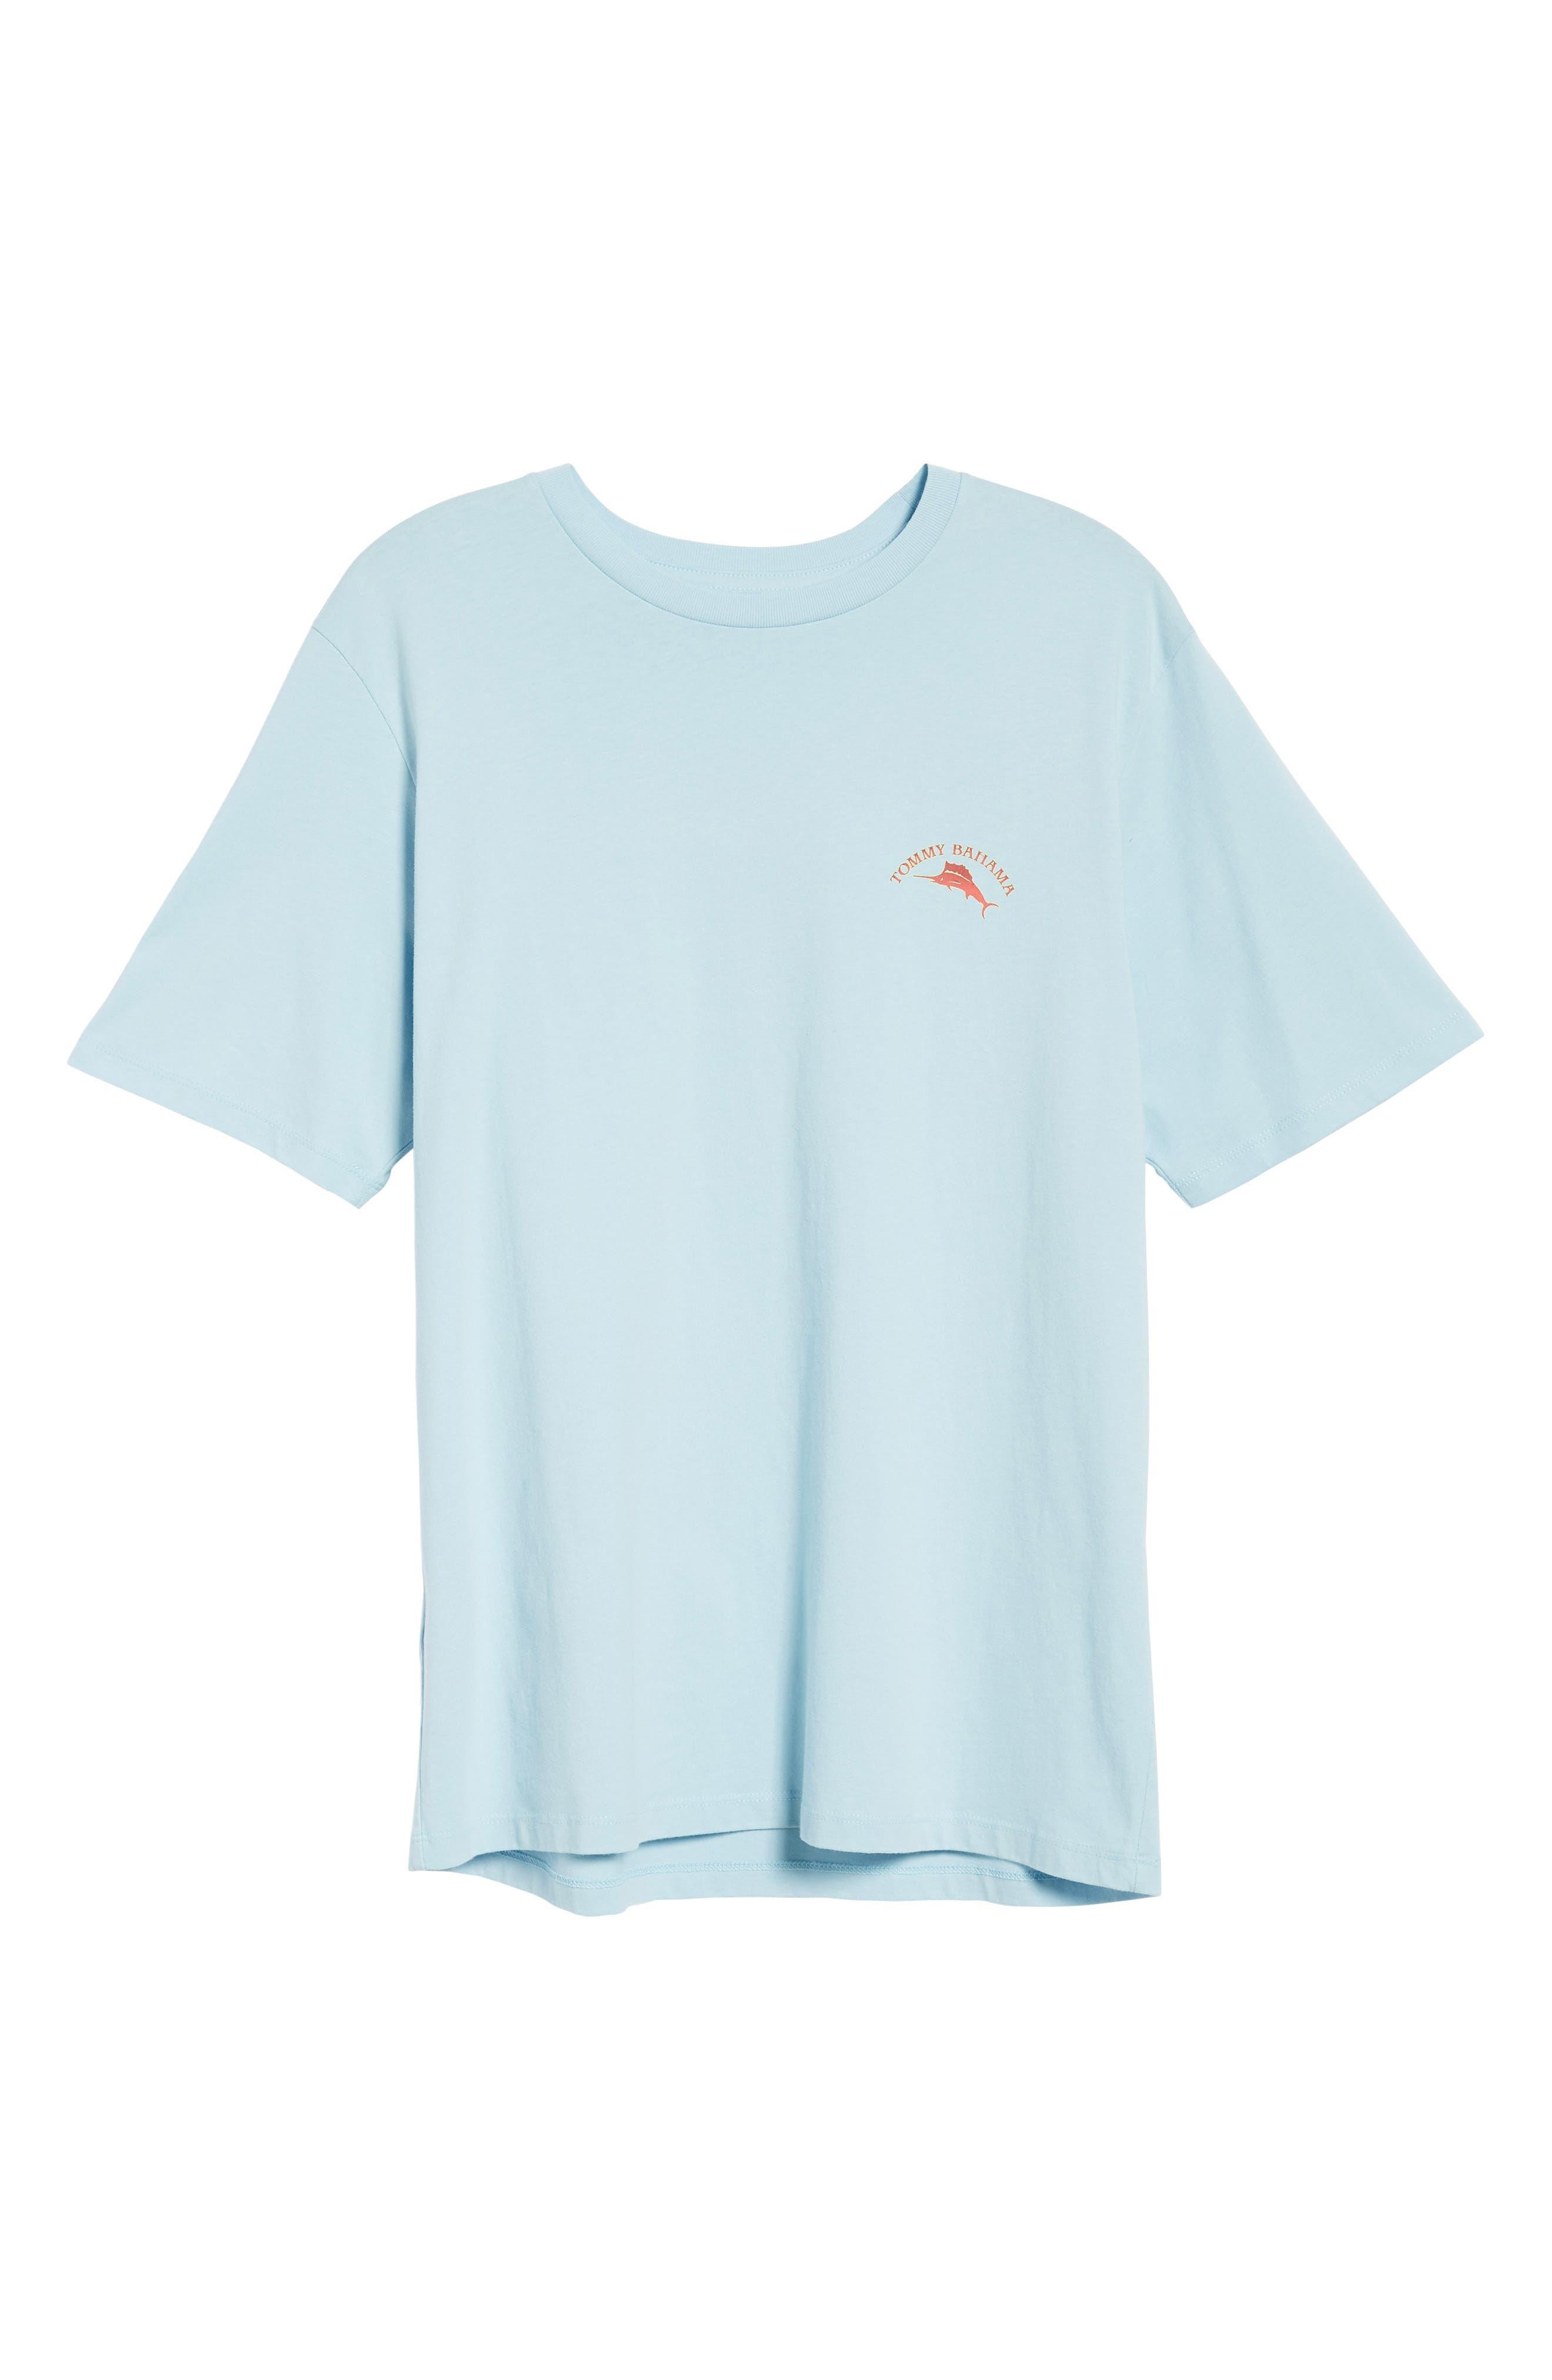 Zinspiration T-Shirt,                             Alternate thumbnail 6, color,                             Opal